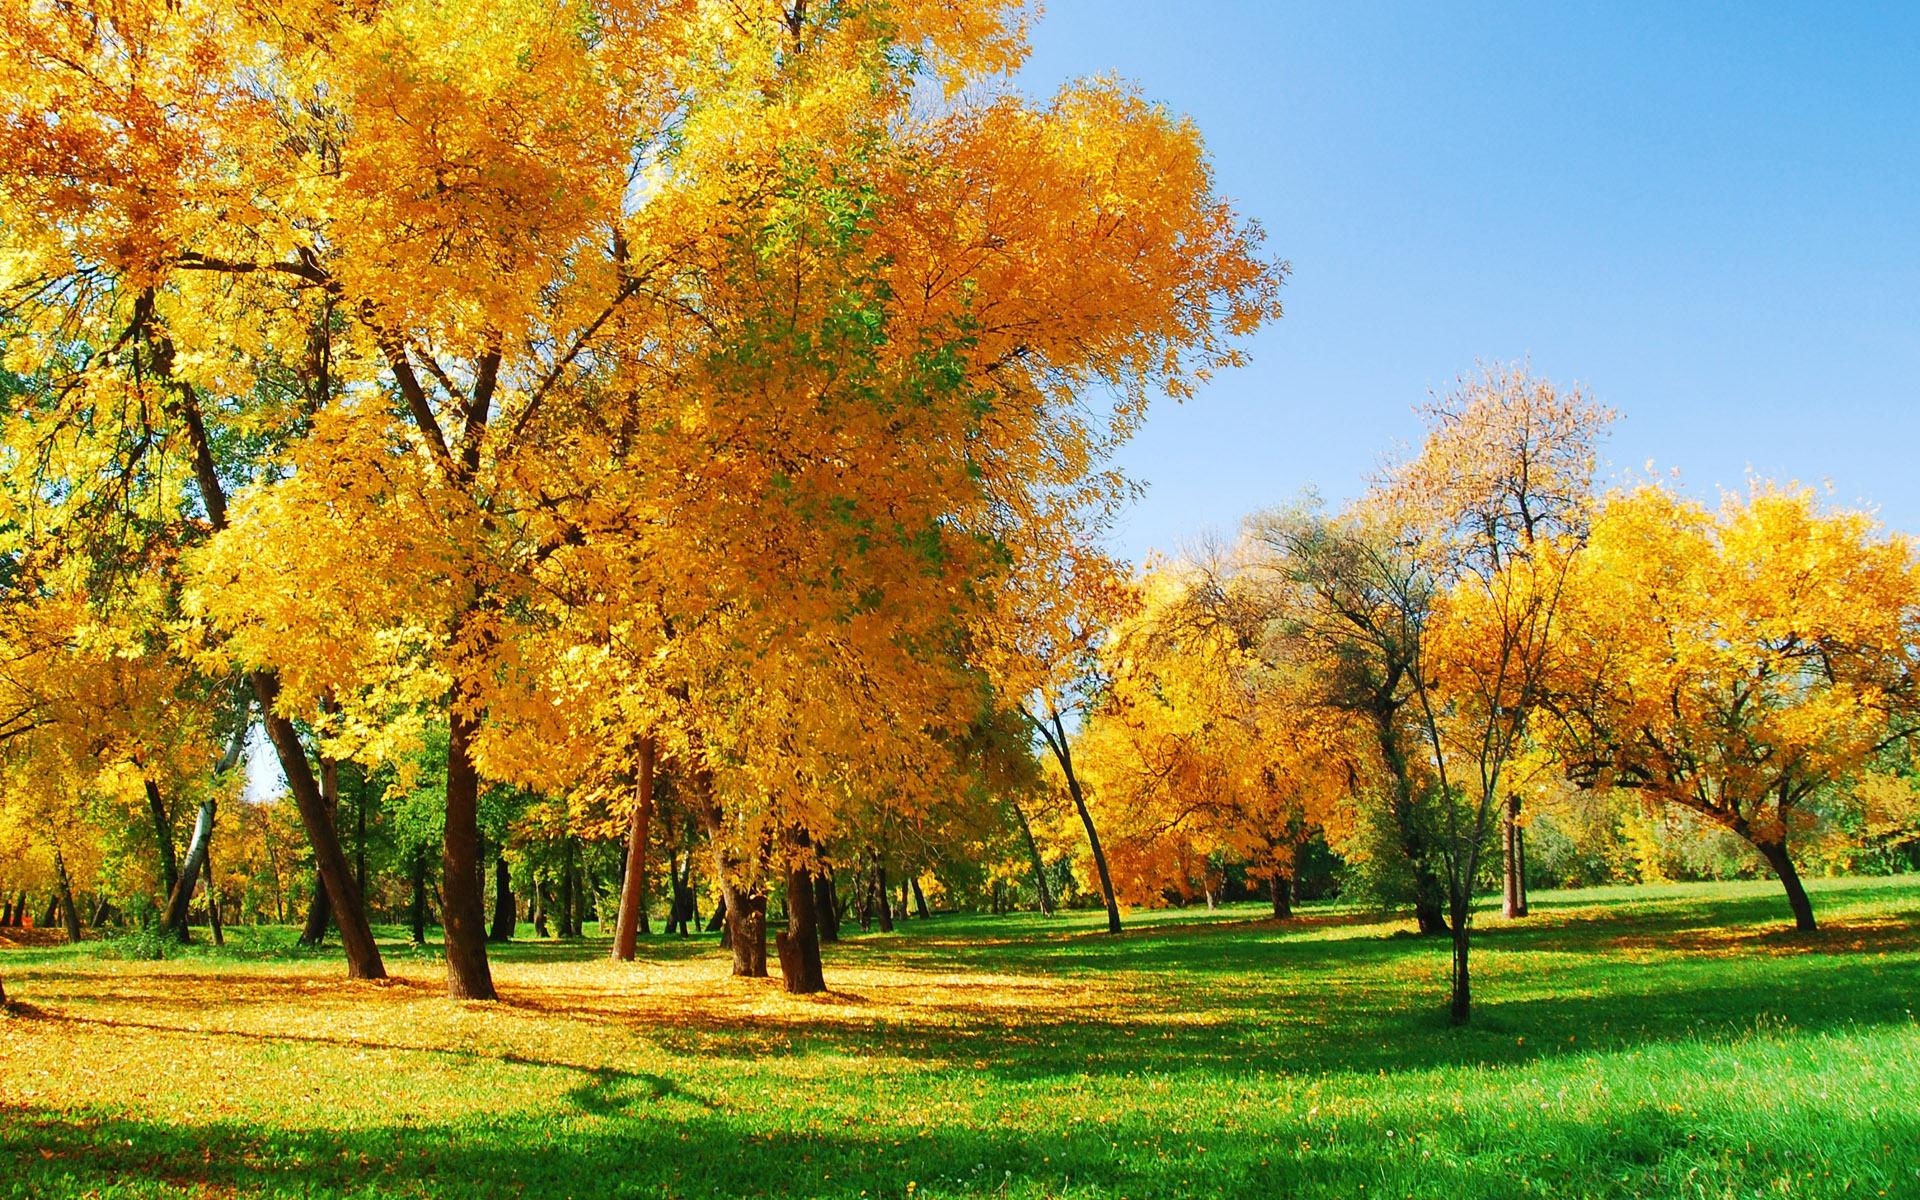 Autumn Park Hd Desktop Wallpaper Coalition of Oregon Land Trusts 1920x1200